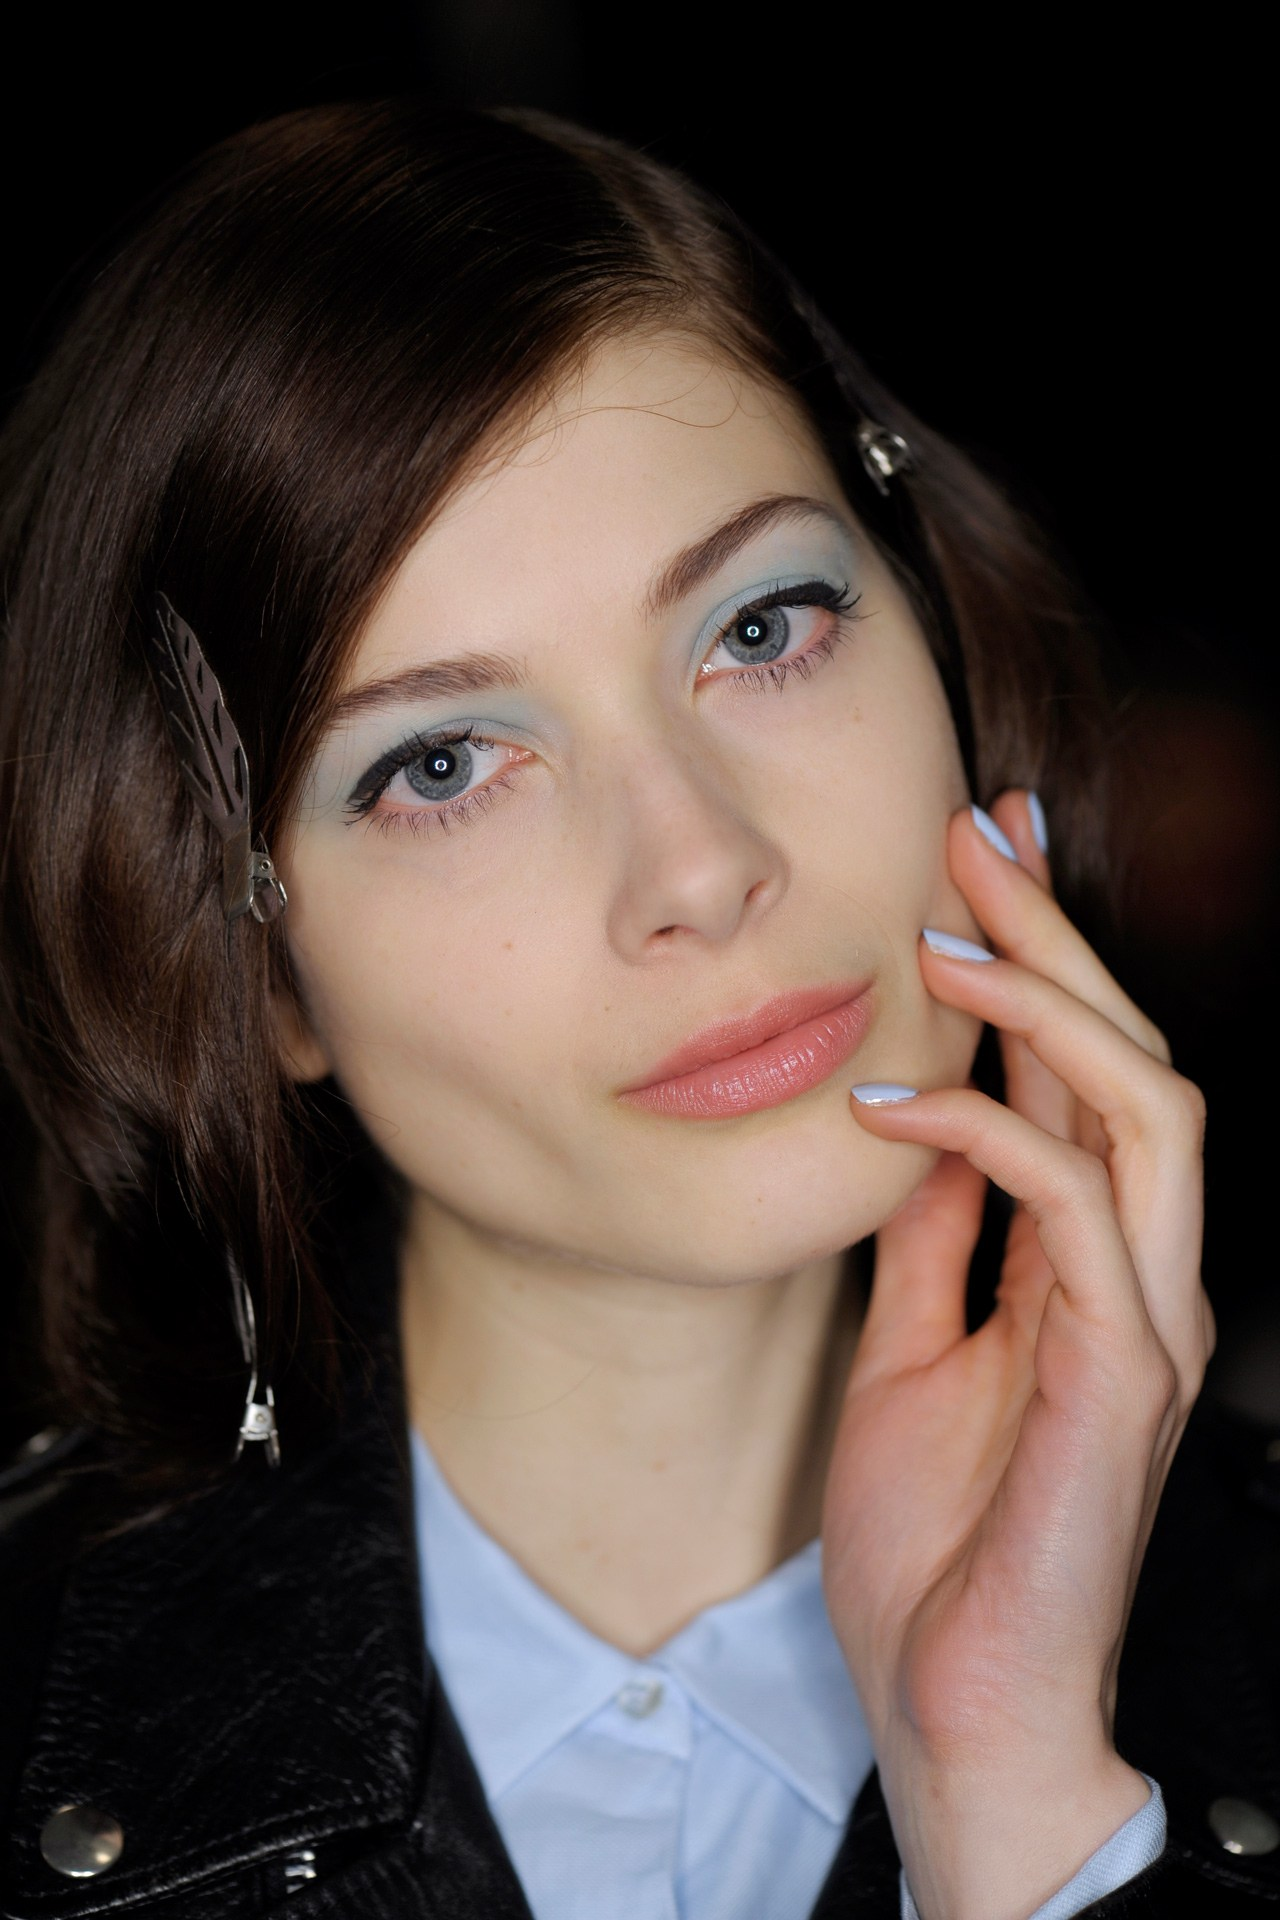 makeup-classes-by-carmina-cristina-learn-how-to-badgley-mischka_14sb034-vogue-29jan14-james-cochrane_b